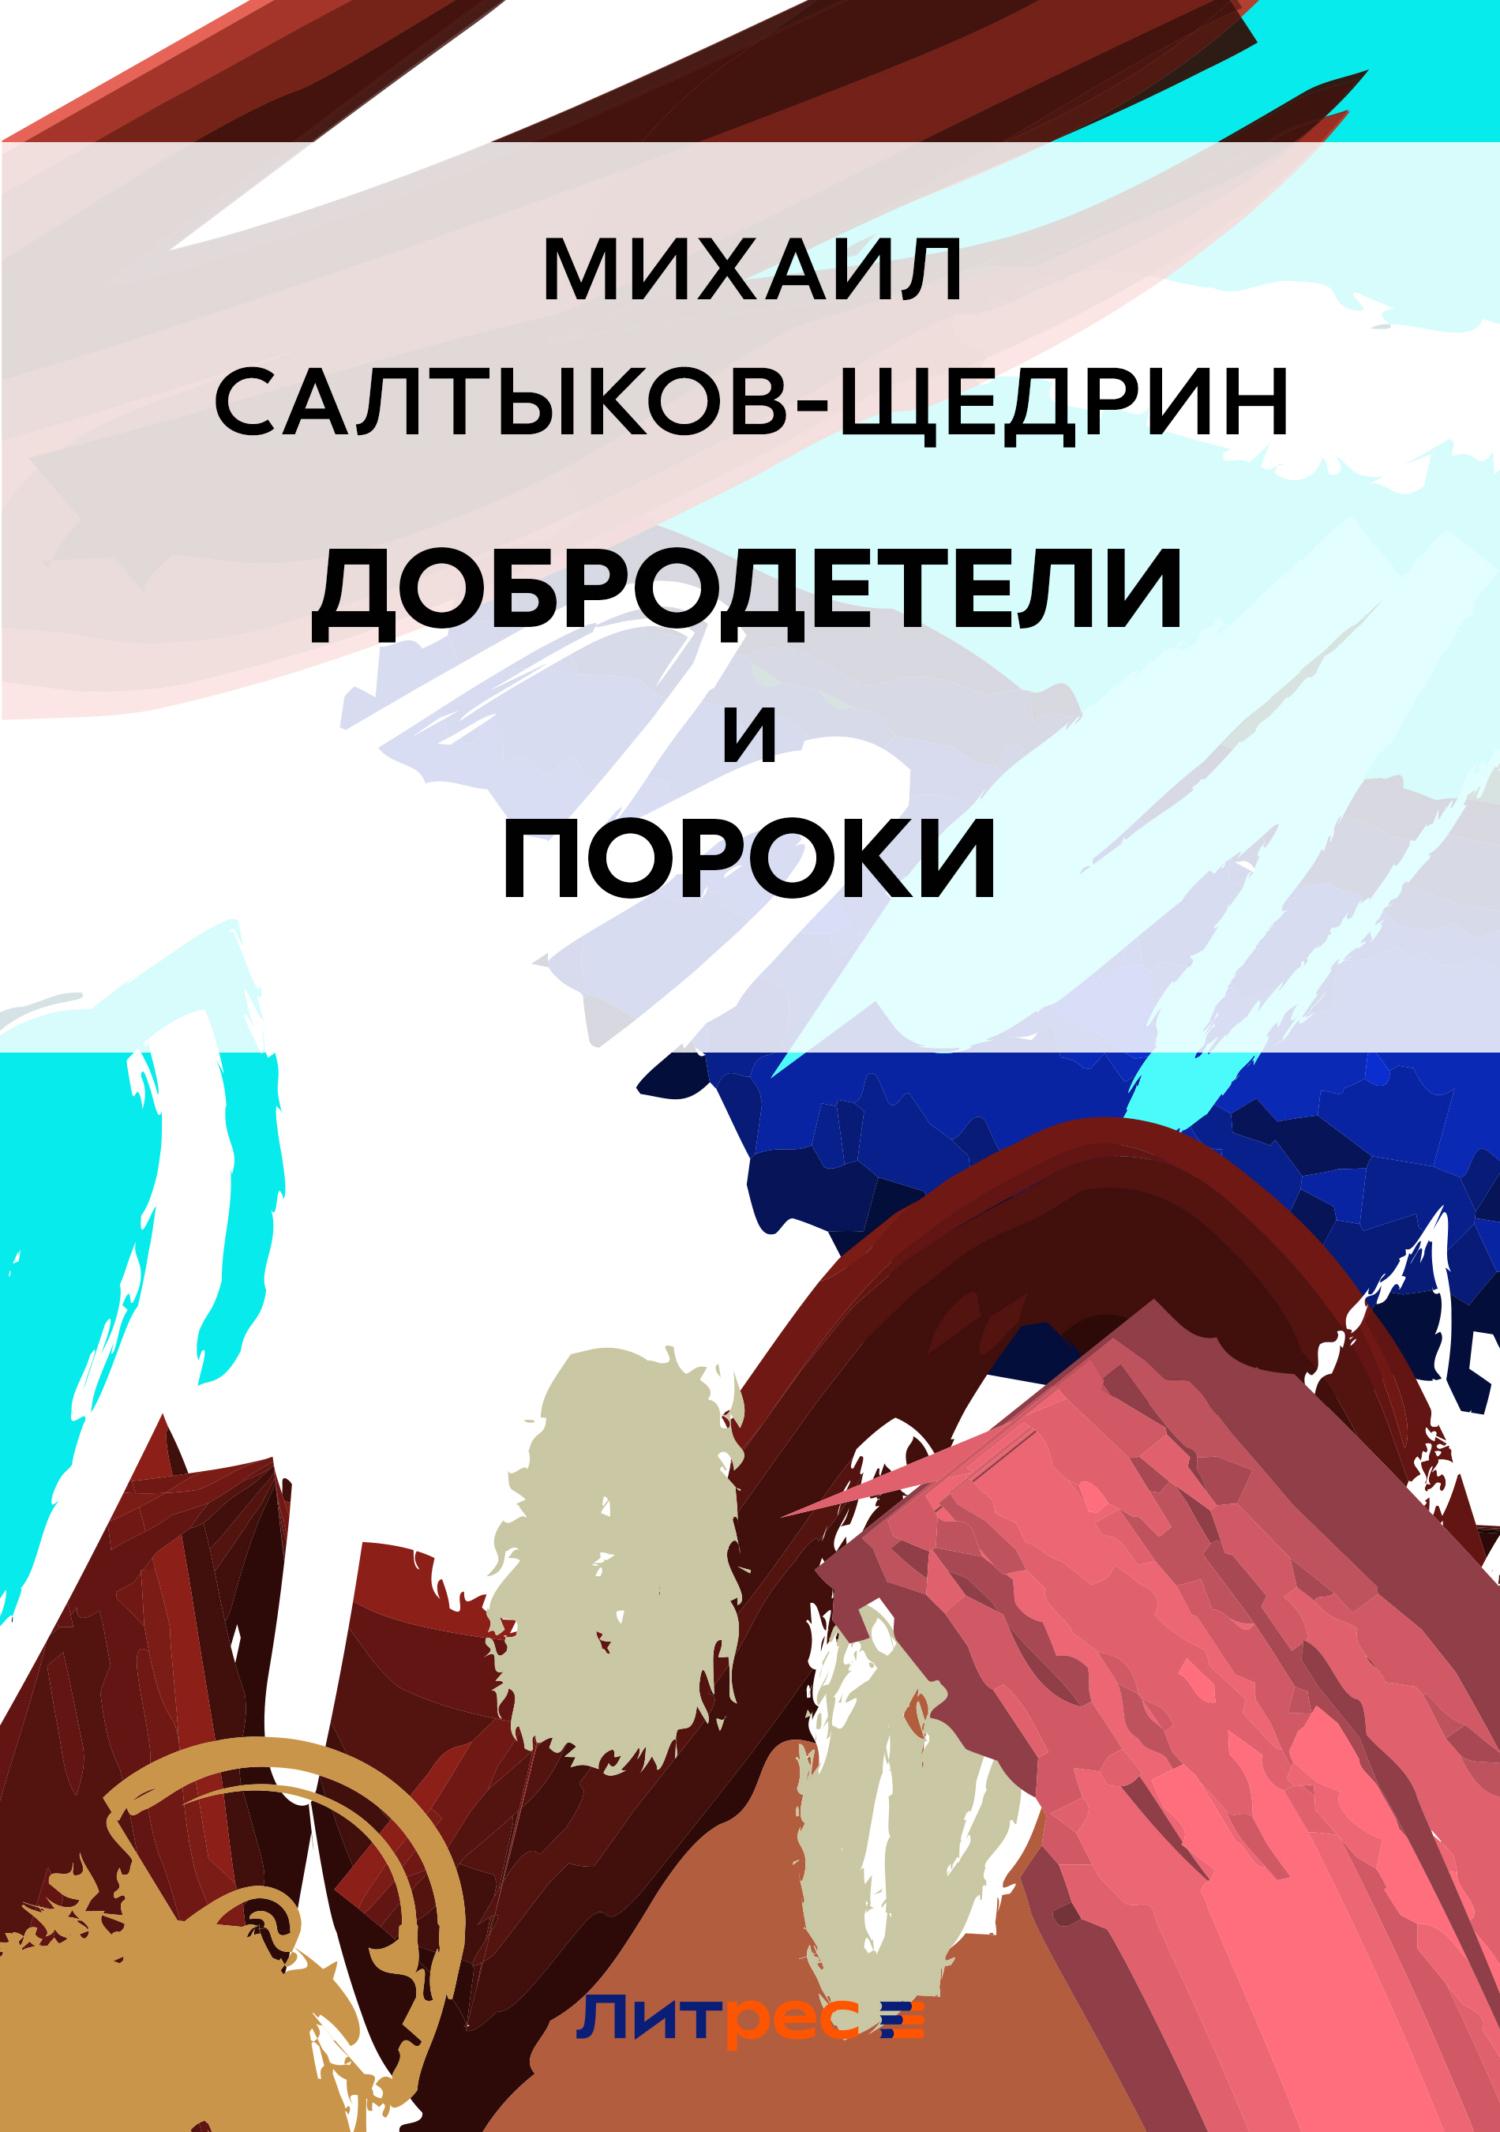 Михаил Салтыков-Щедрин Добродетели и пороки оркестр шоу sting the beatles queen